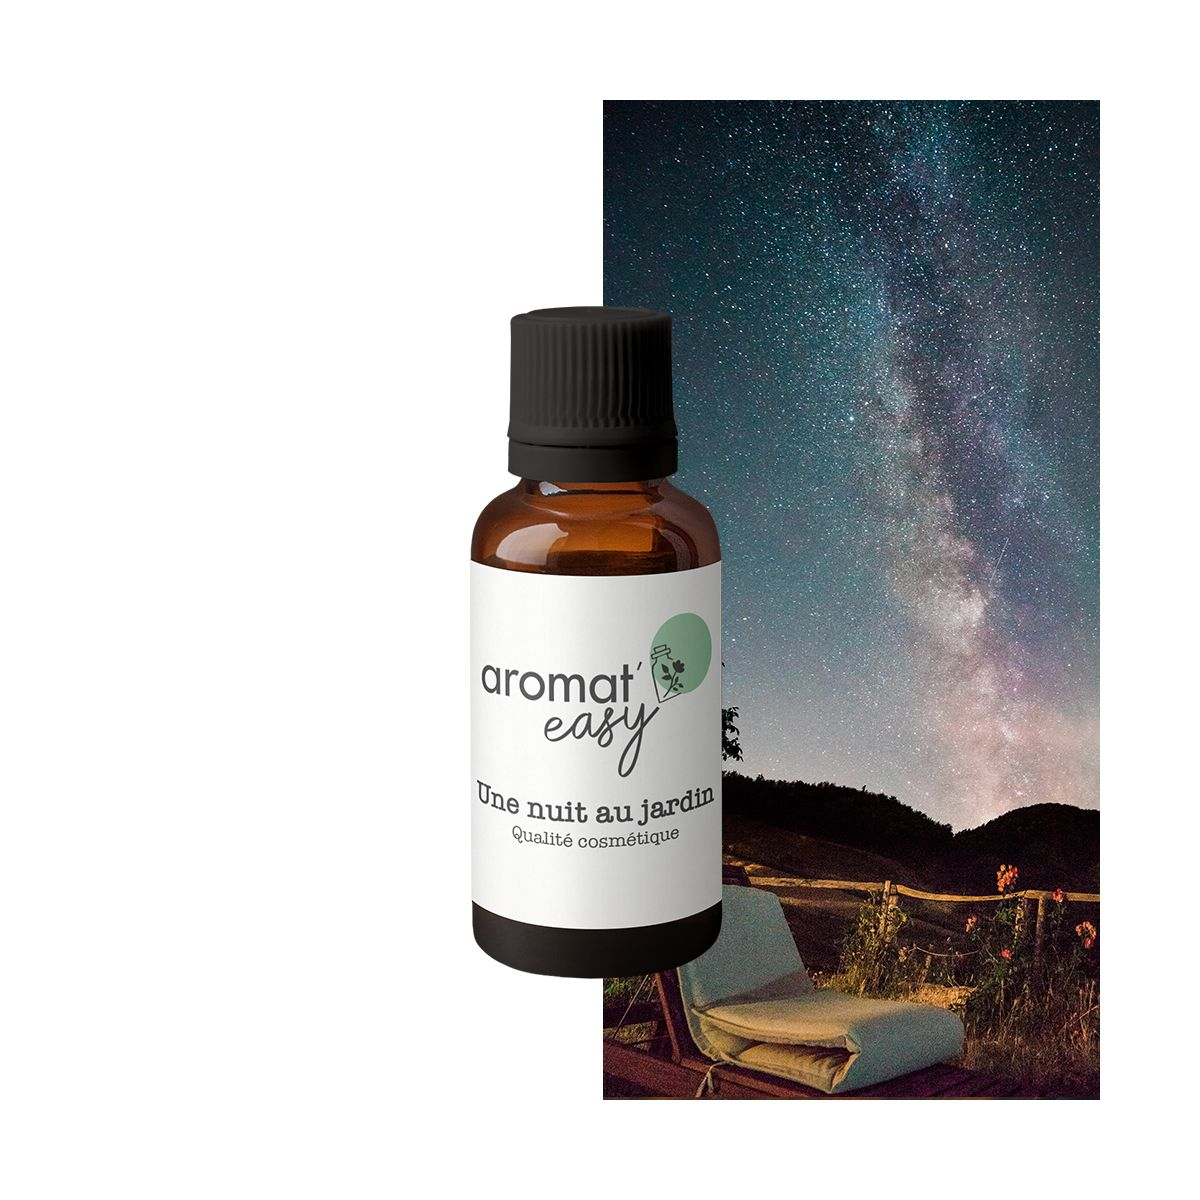 Fragrance Une nuit au jardin